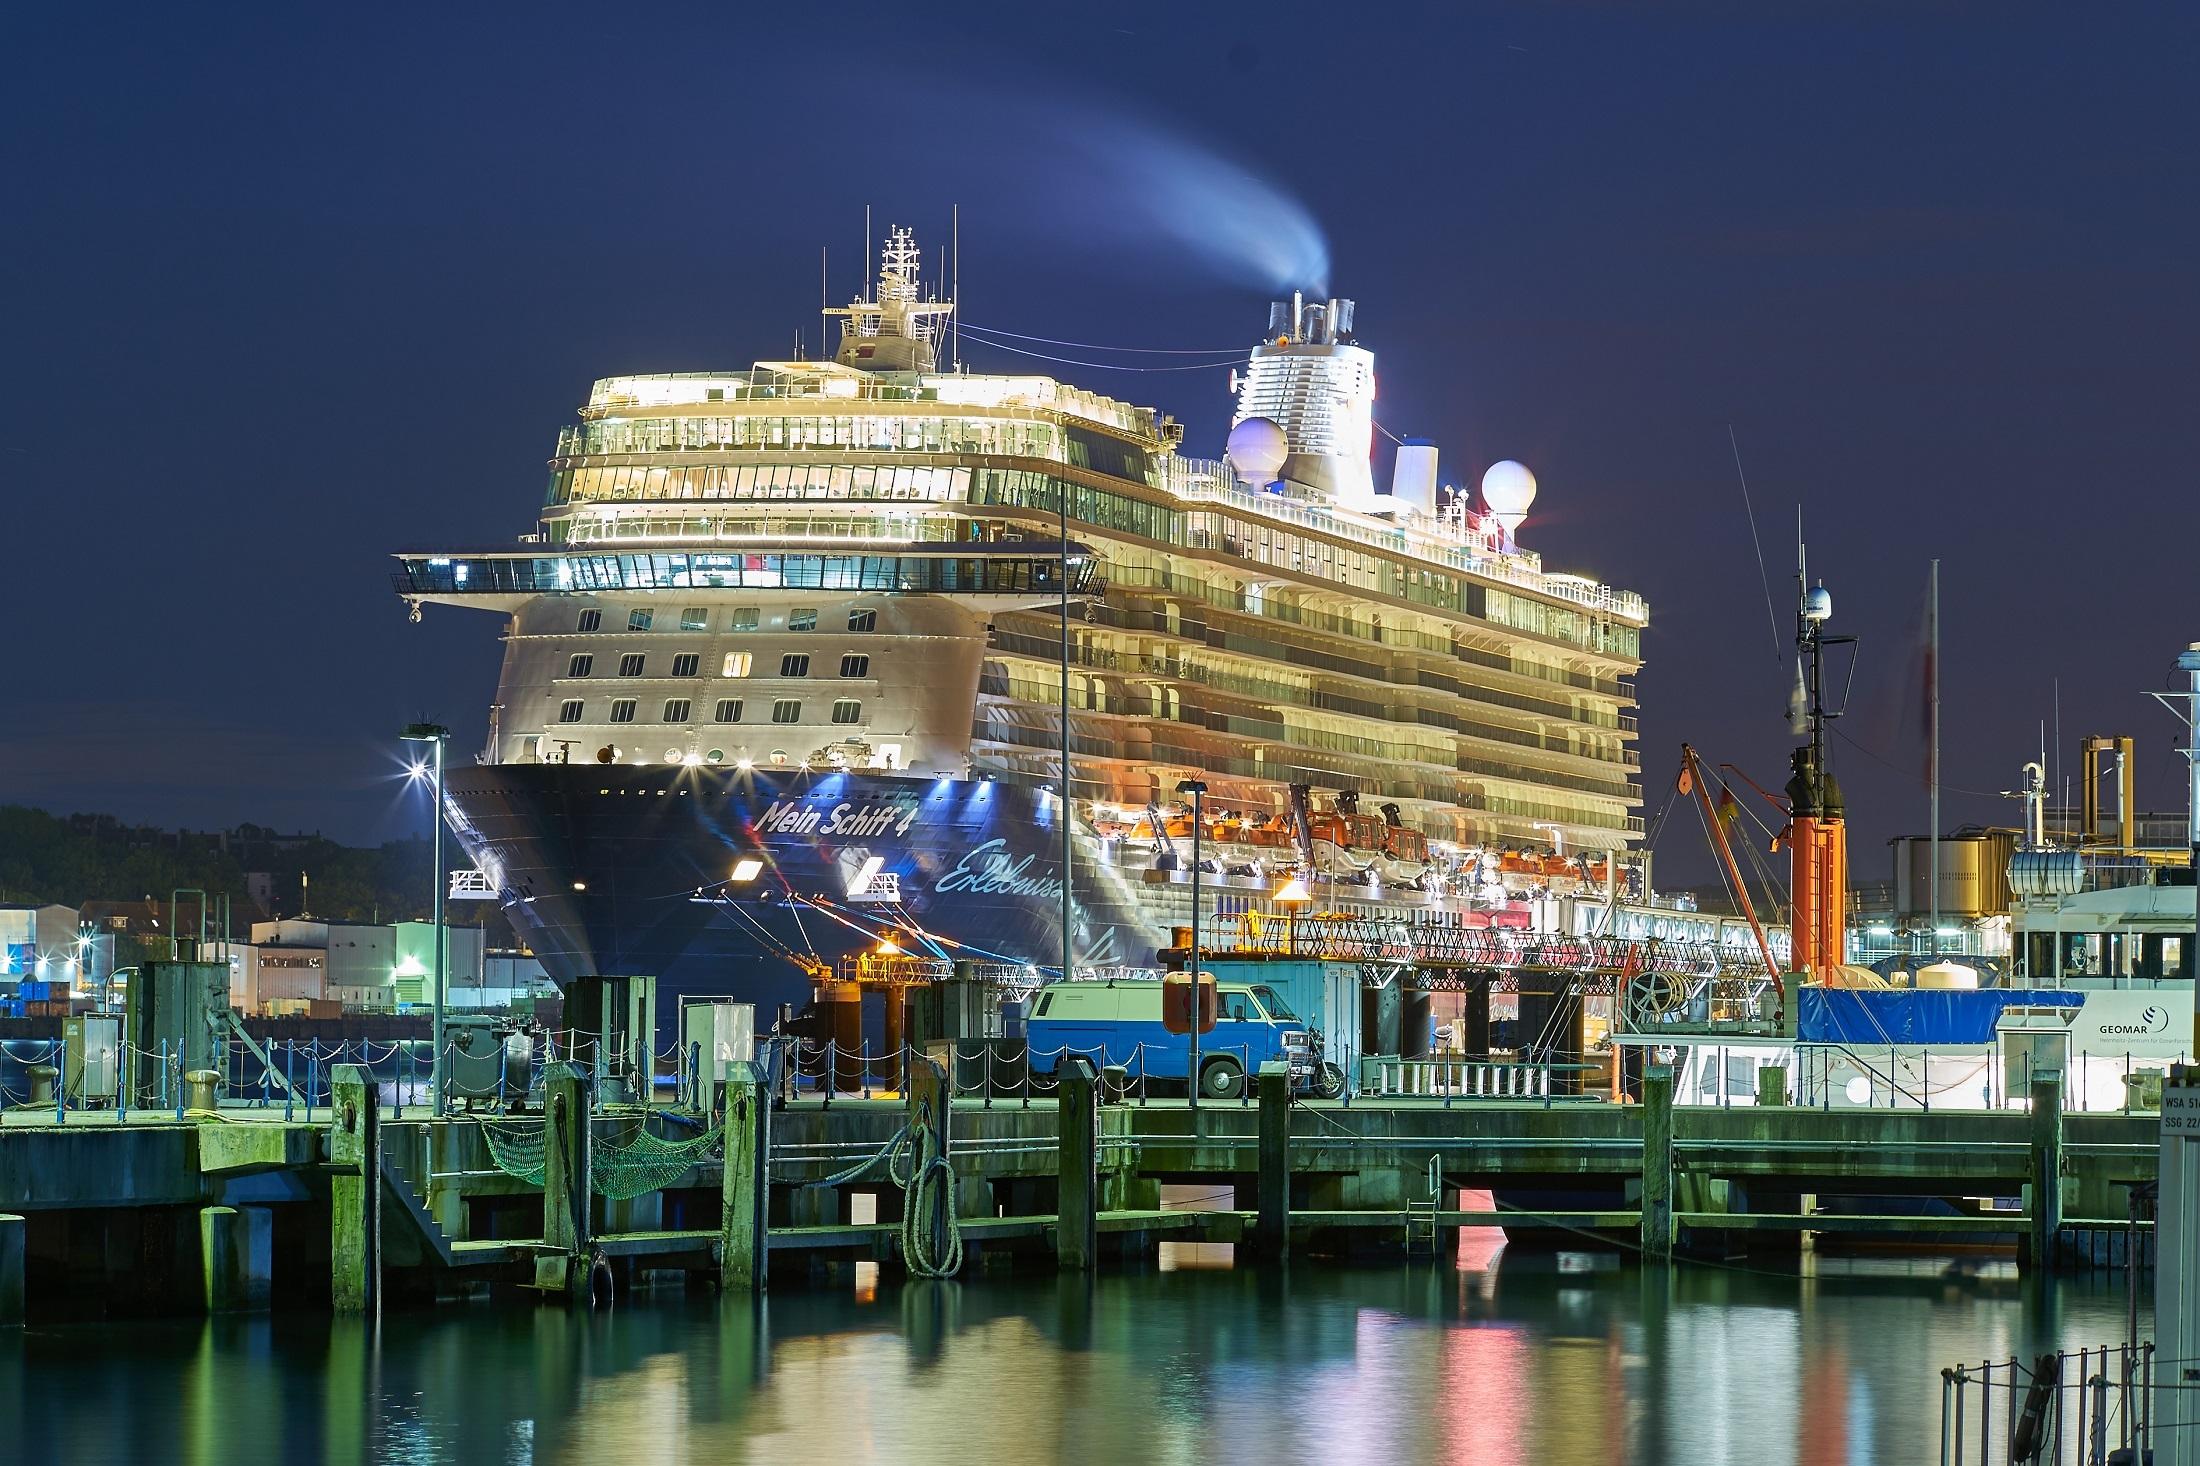 Cruise Ship, Transport, Ship, Cruise, Boat, HQ Photo